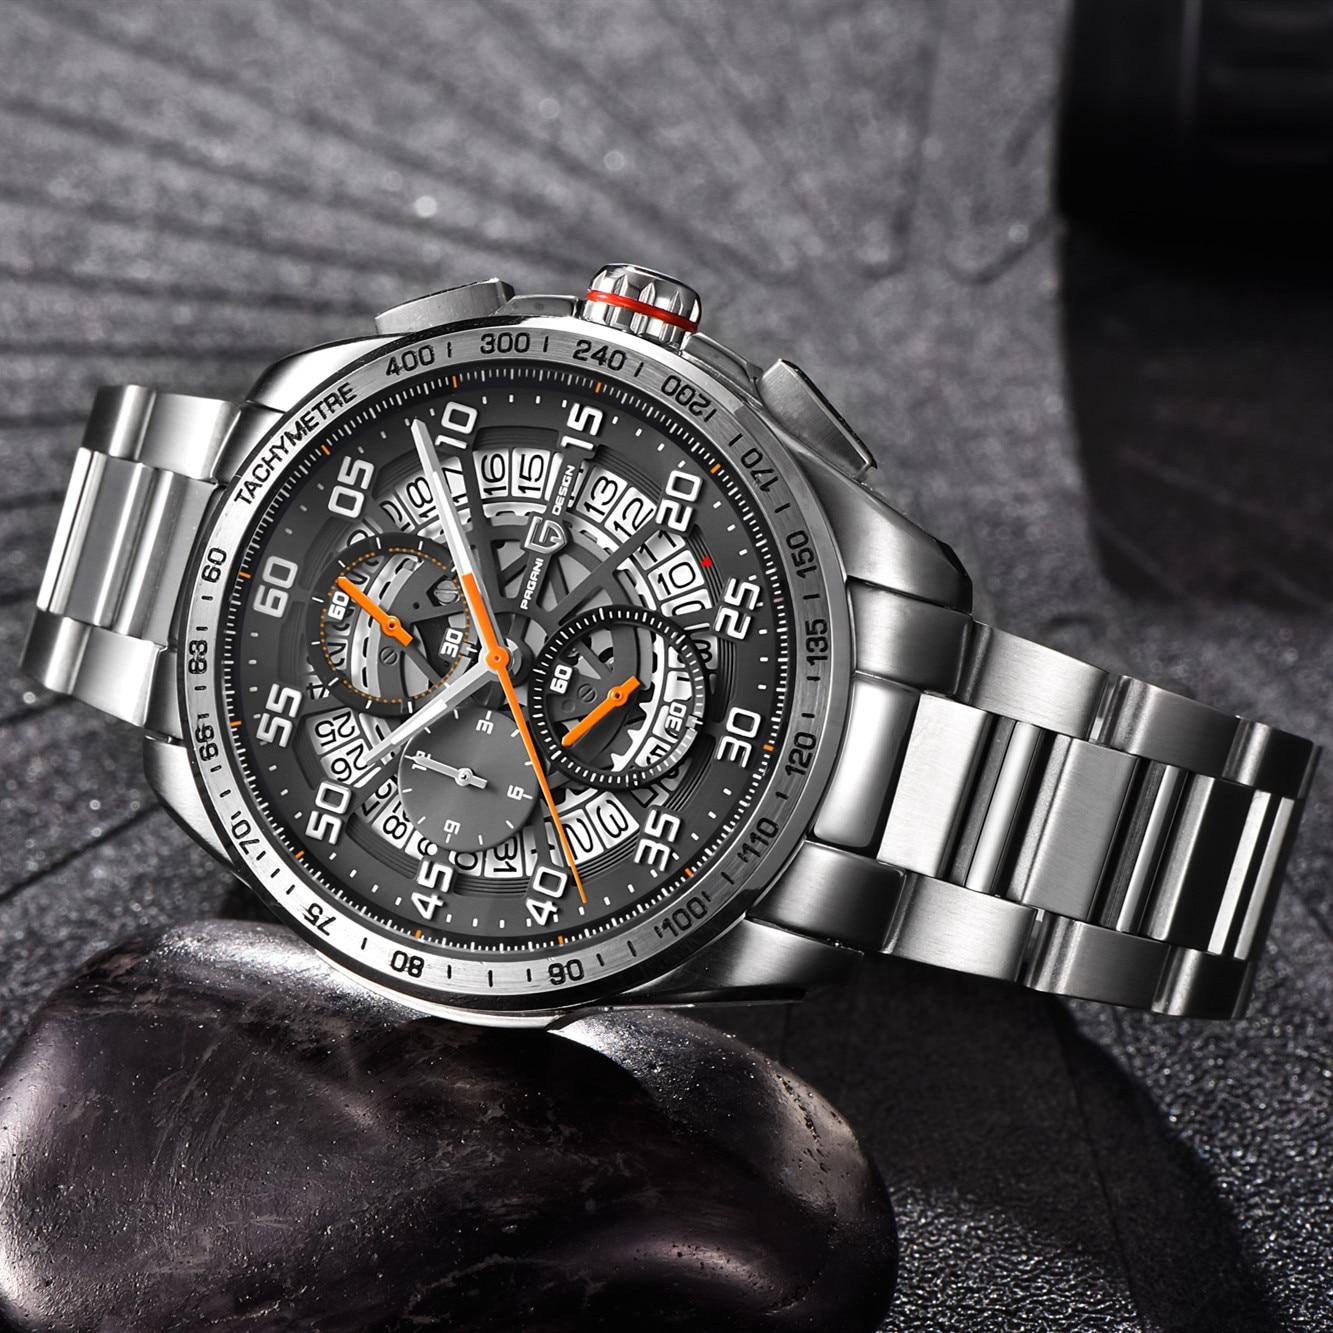 Relojes deportivos de marca de diseño PAGANI para hombre, cronógrafo militar, reloj militar de cuarzo, acero inoxidable, reloj militar para hombre, reloj Masculino, Saat - 3